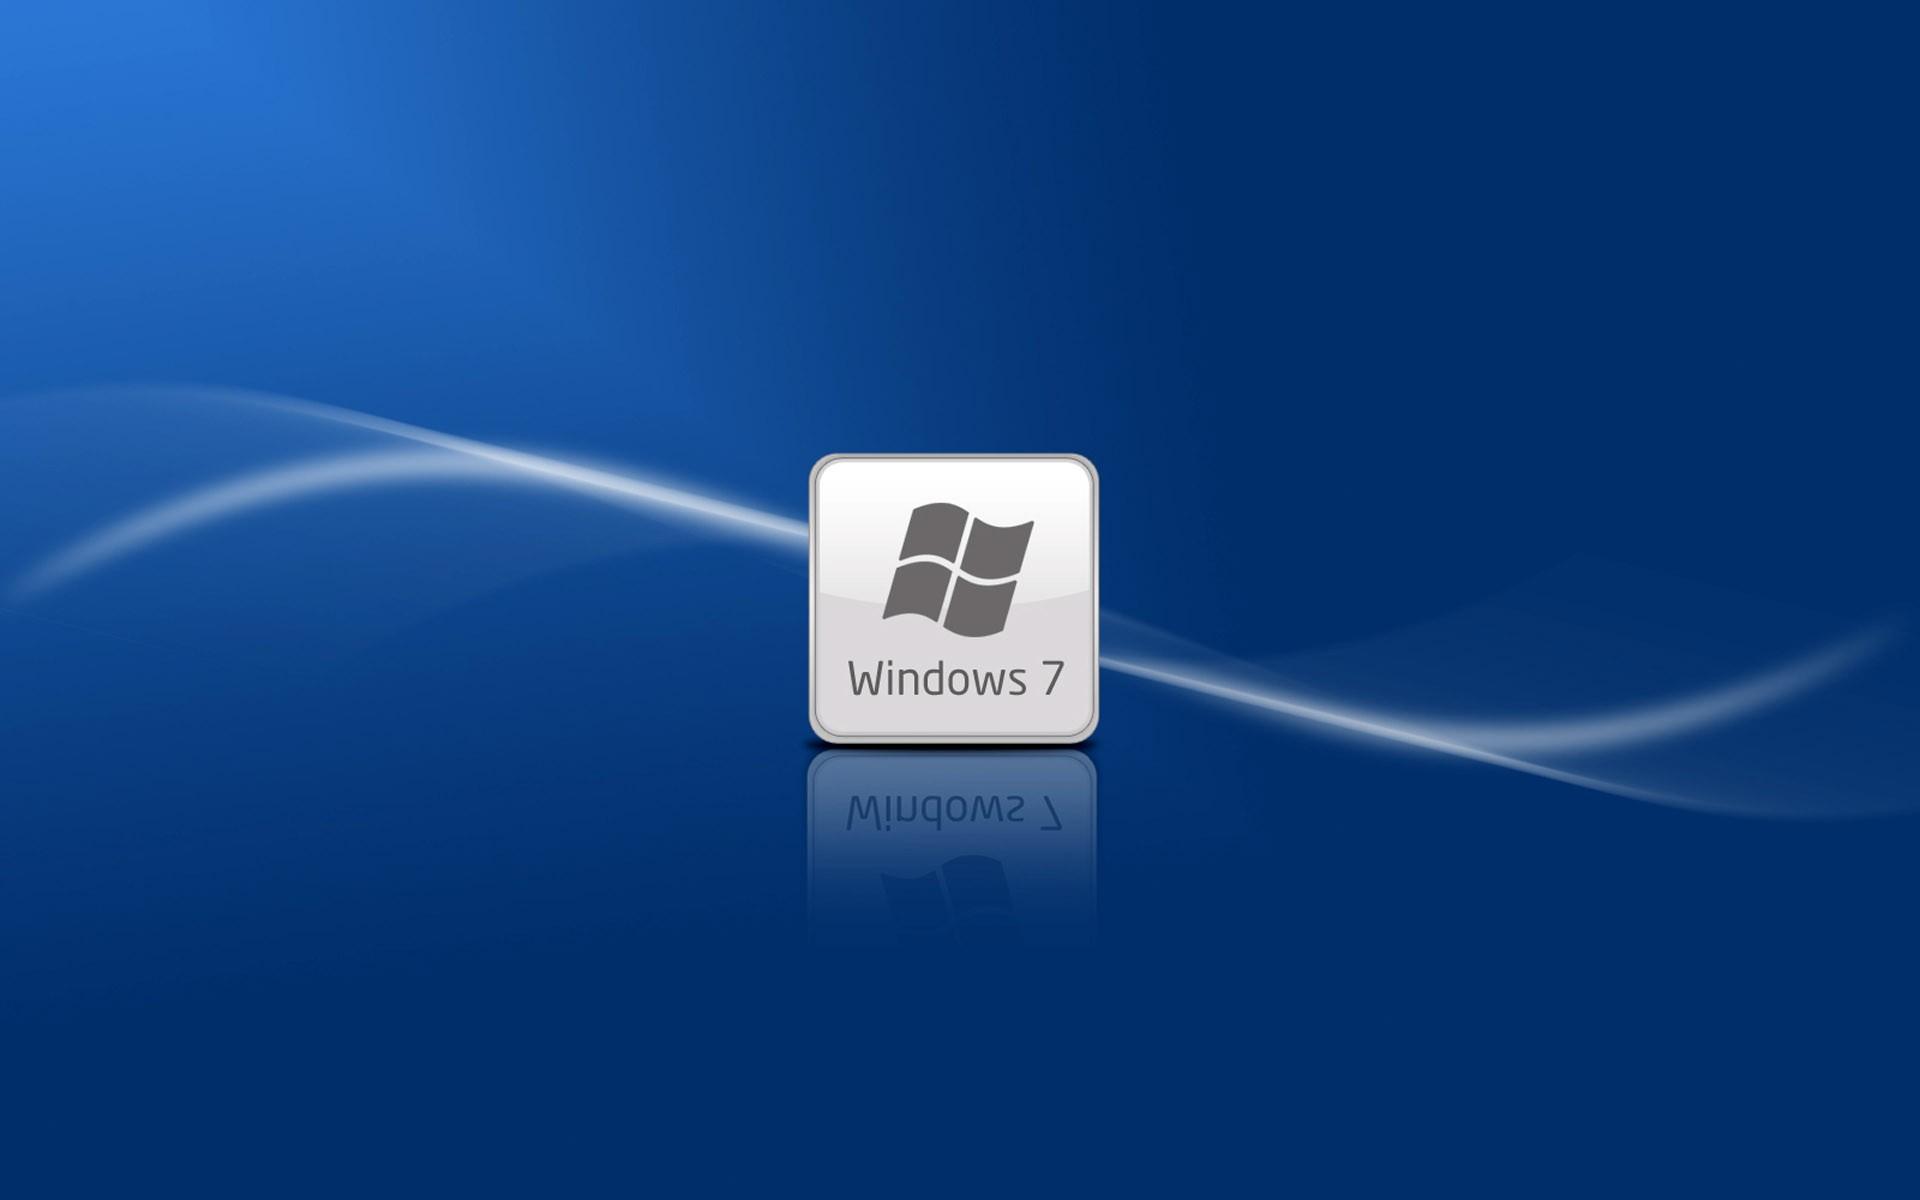 Microsoft Backgrounds Hd wallpaper wallpaper hd background desktop 1920x1200